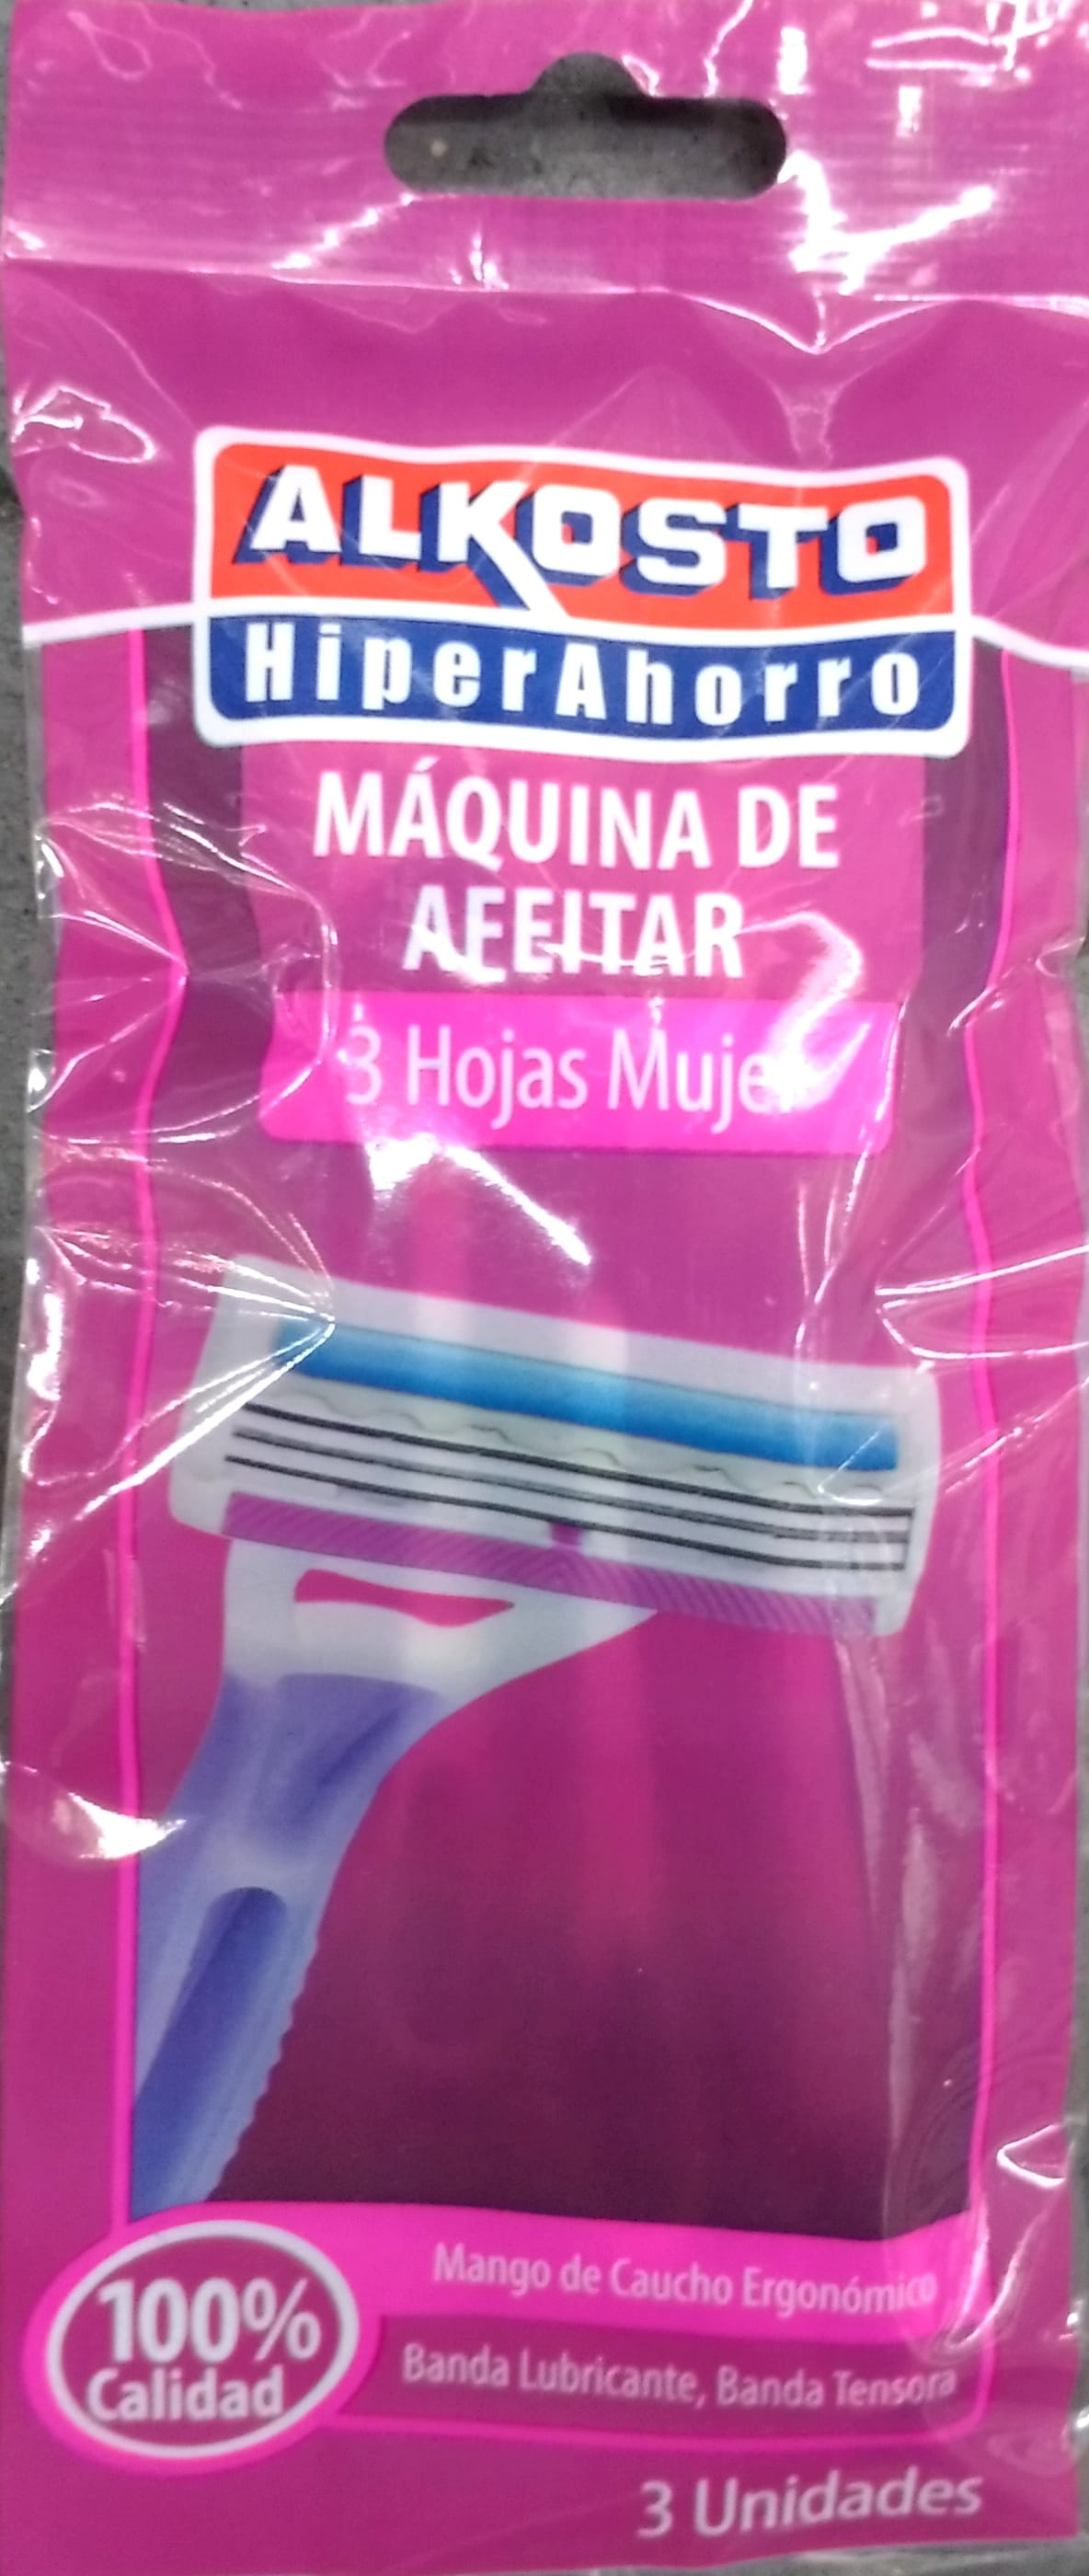 Maquina Afeitar Alkosto Mujer 3hojas 3u